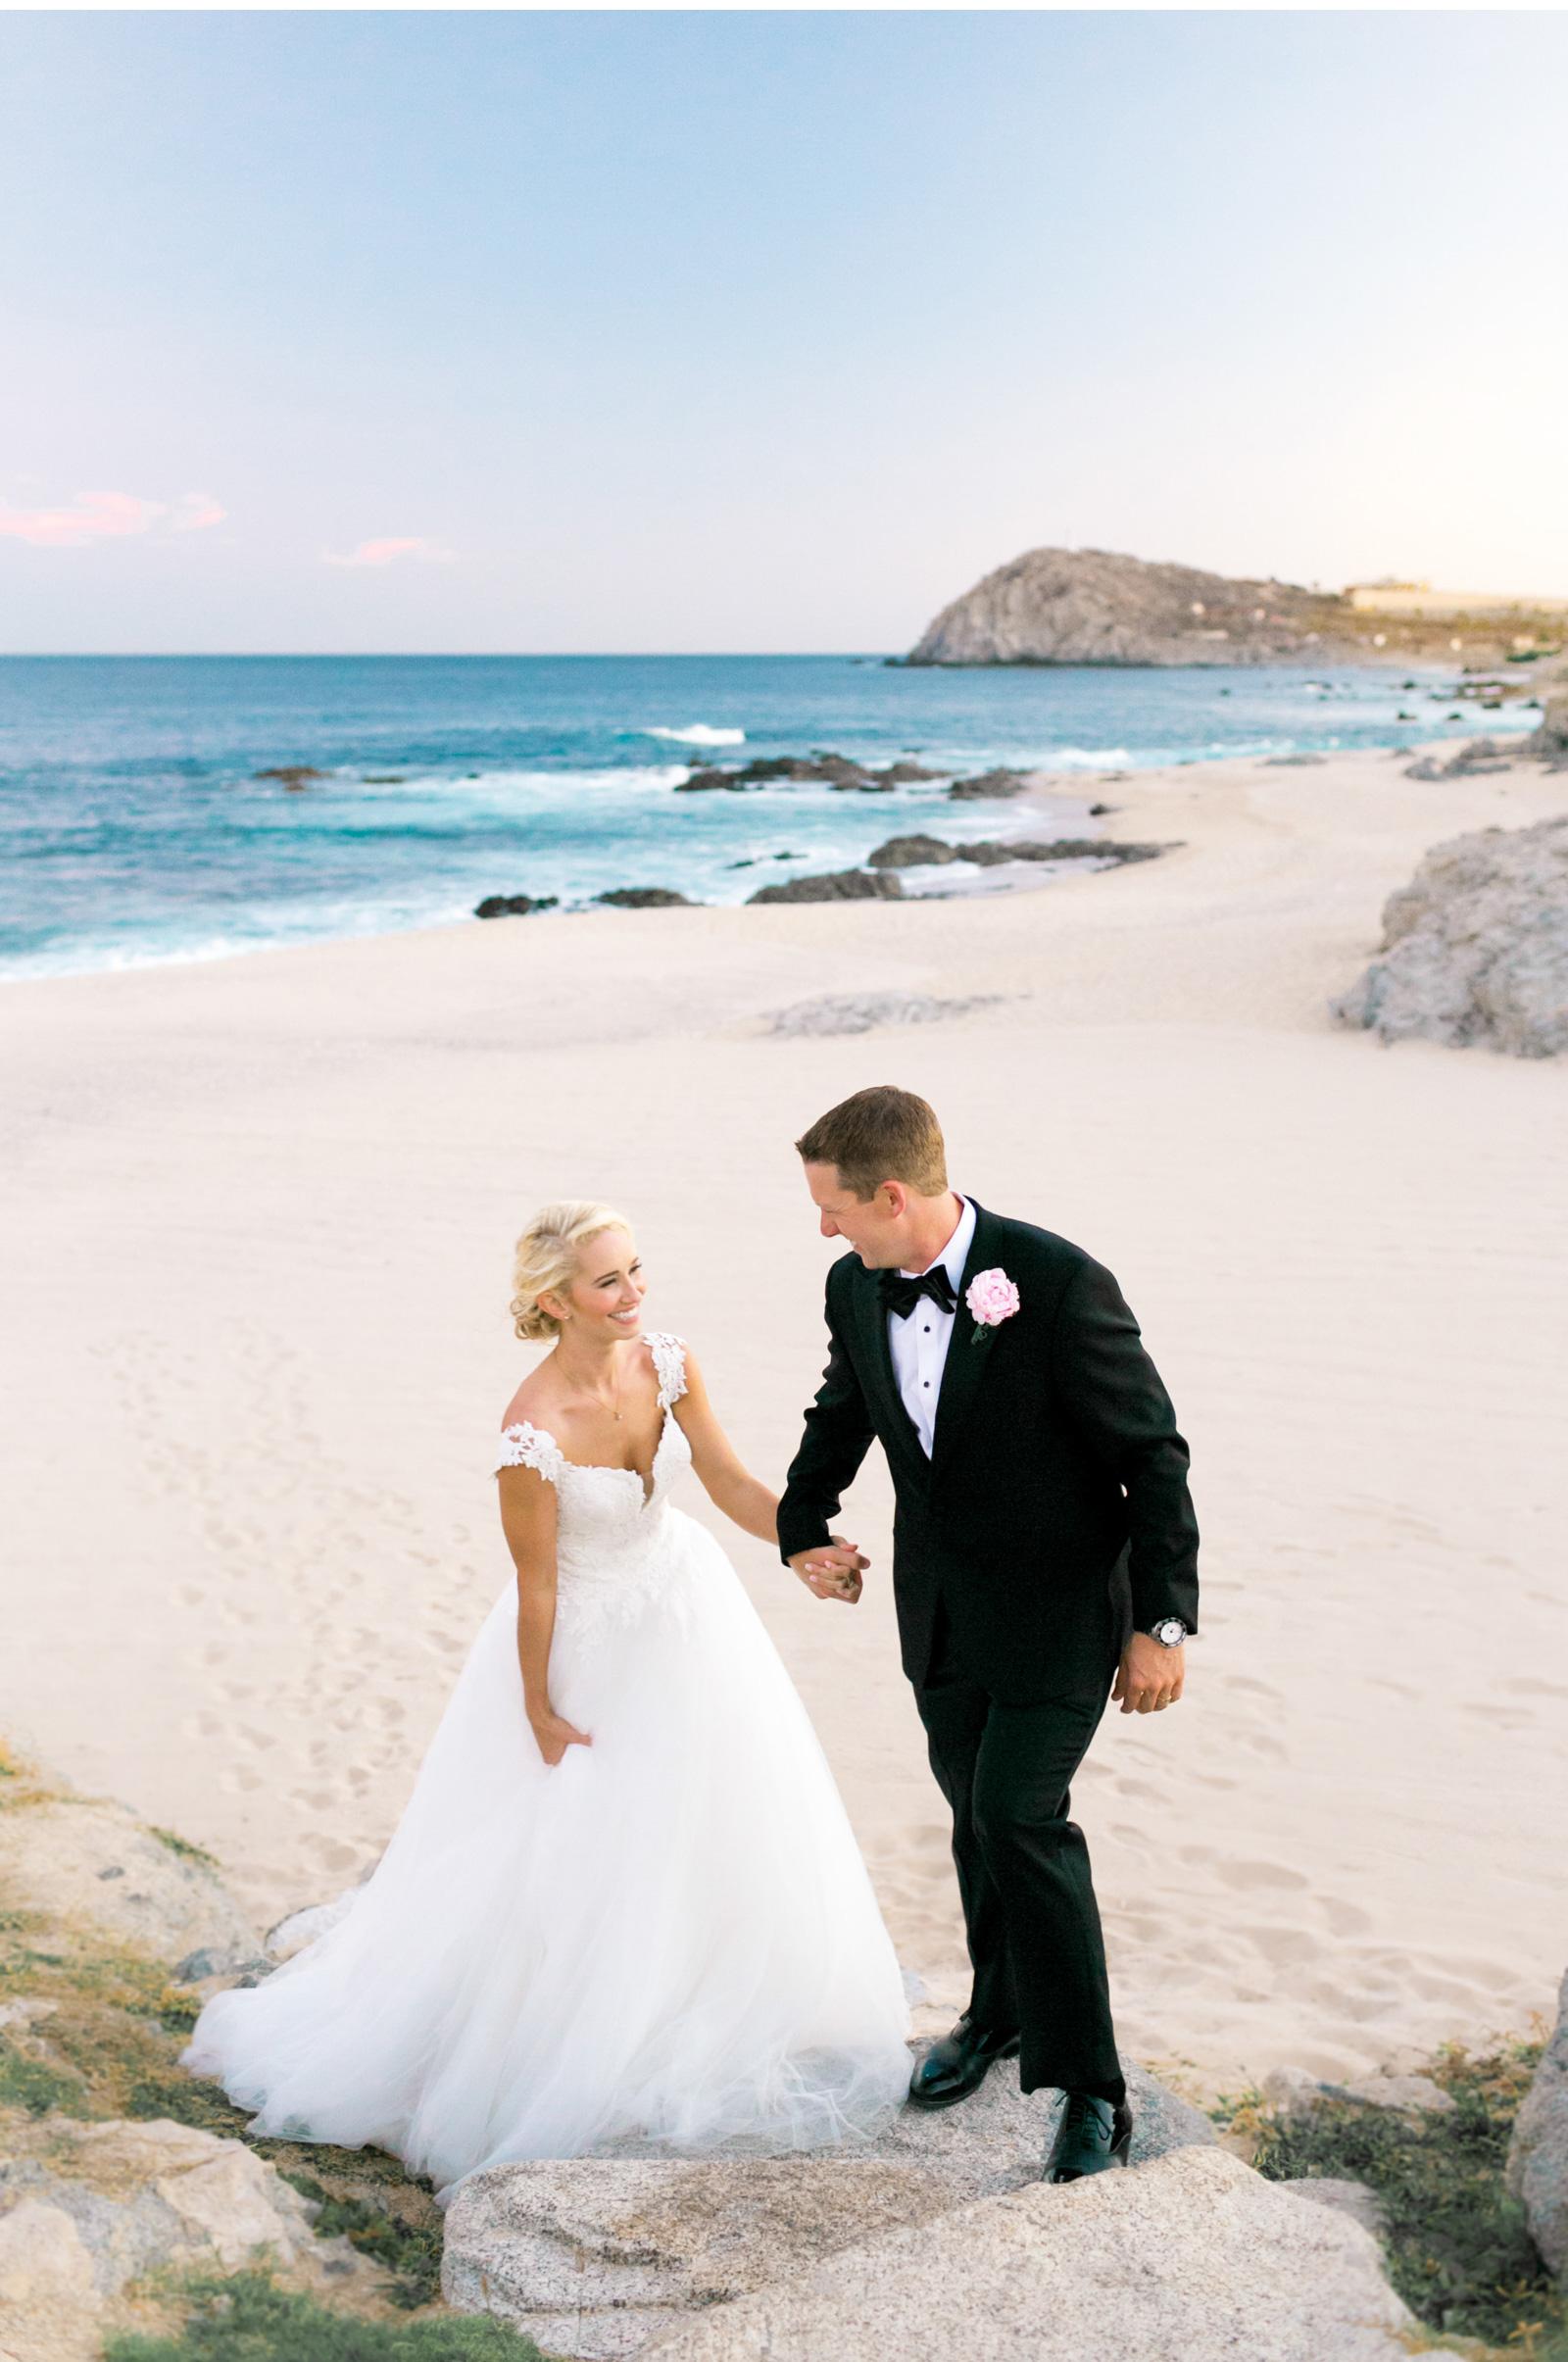 Hawaii-Destination-Wedding-Natalie-Schutt-Photography-Style-Me-Pretty_01.jpg